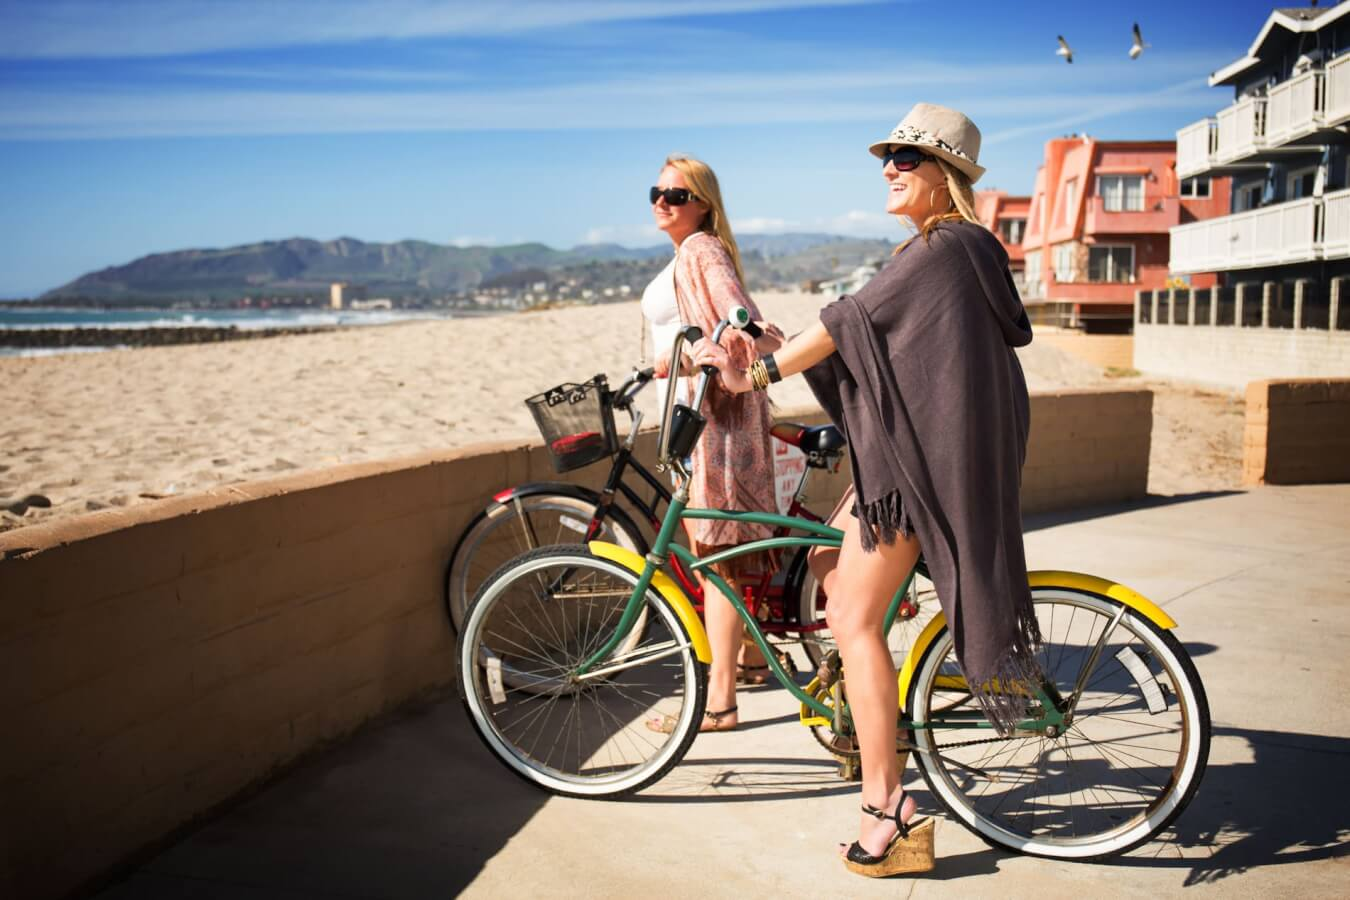 Biking on south seaward ave Ventura